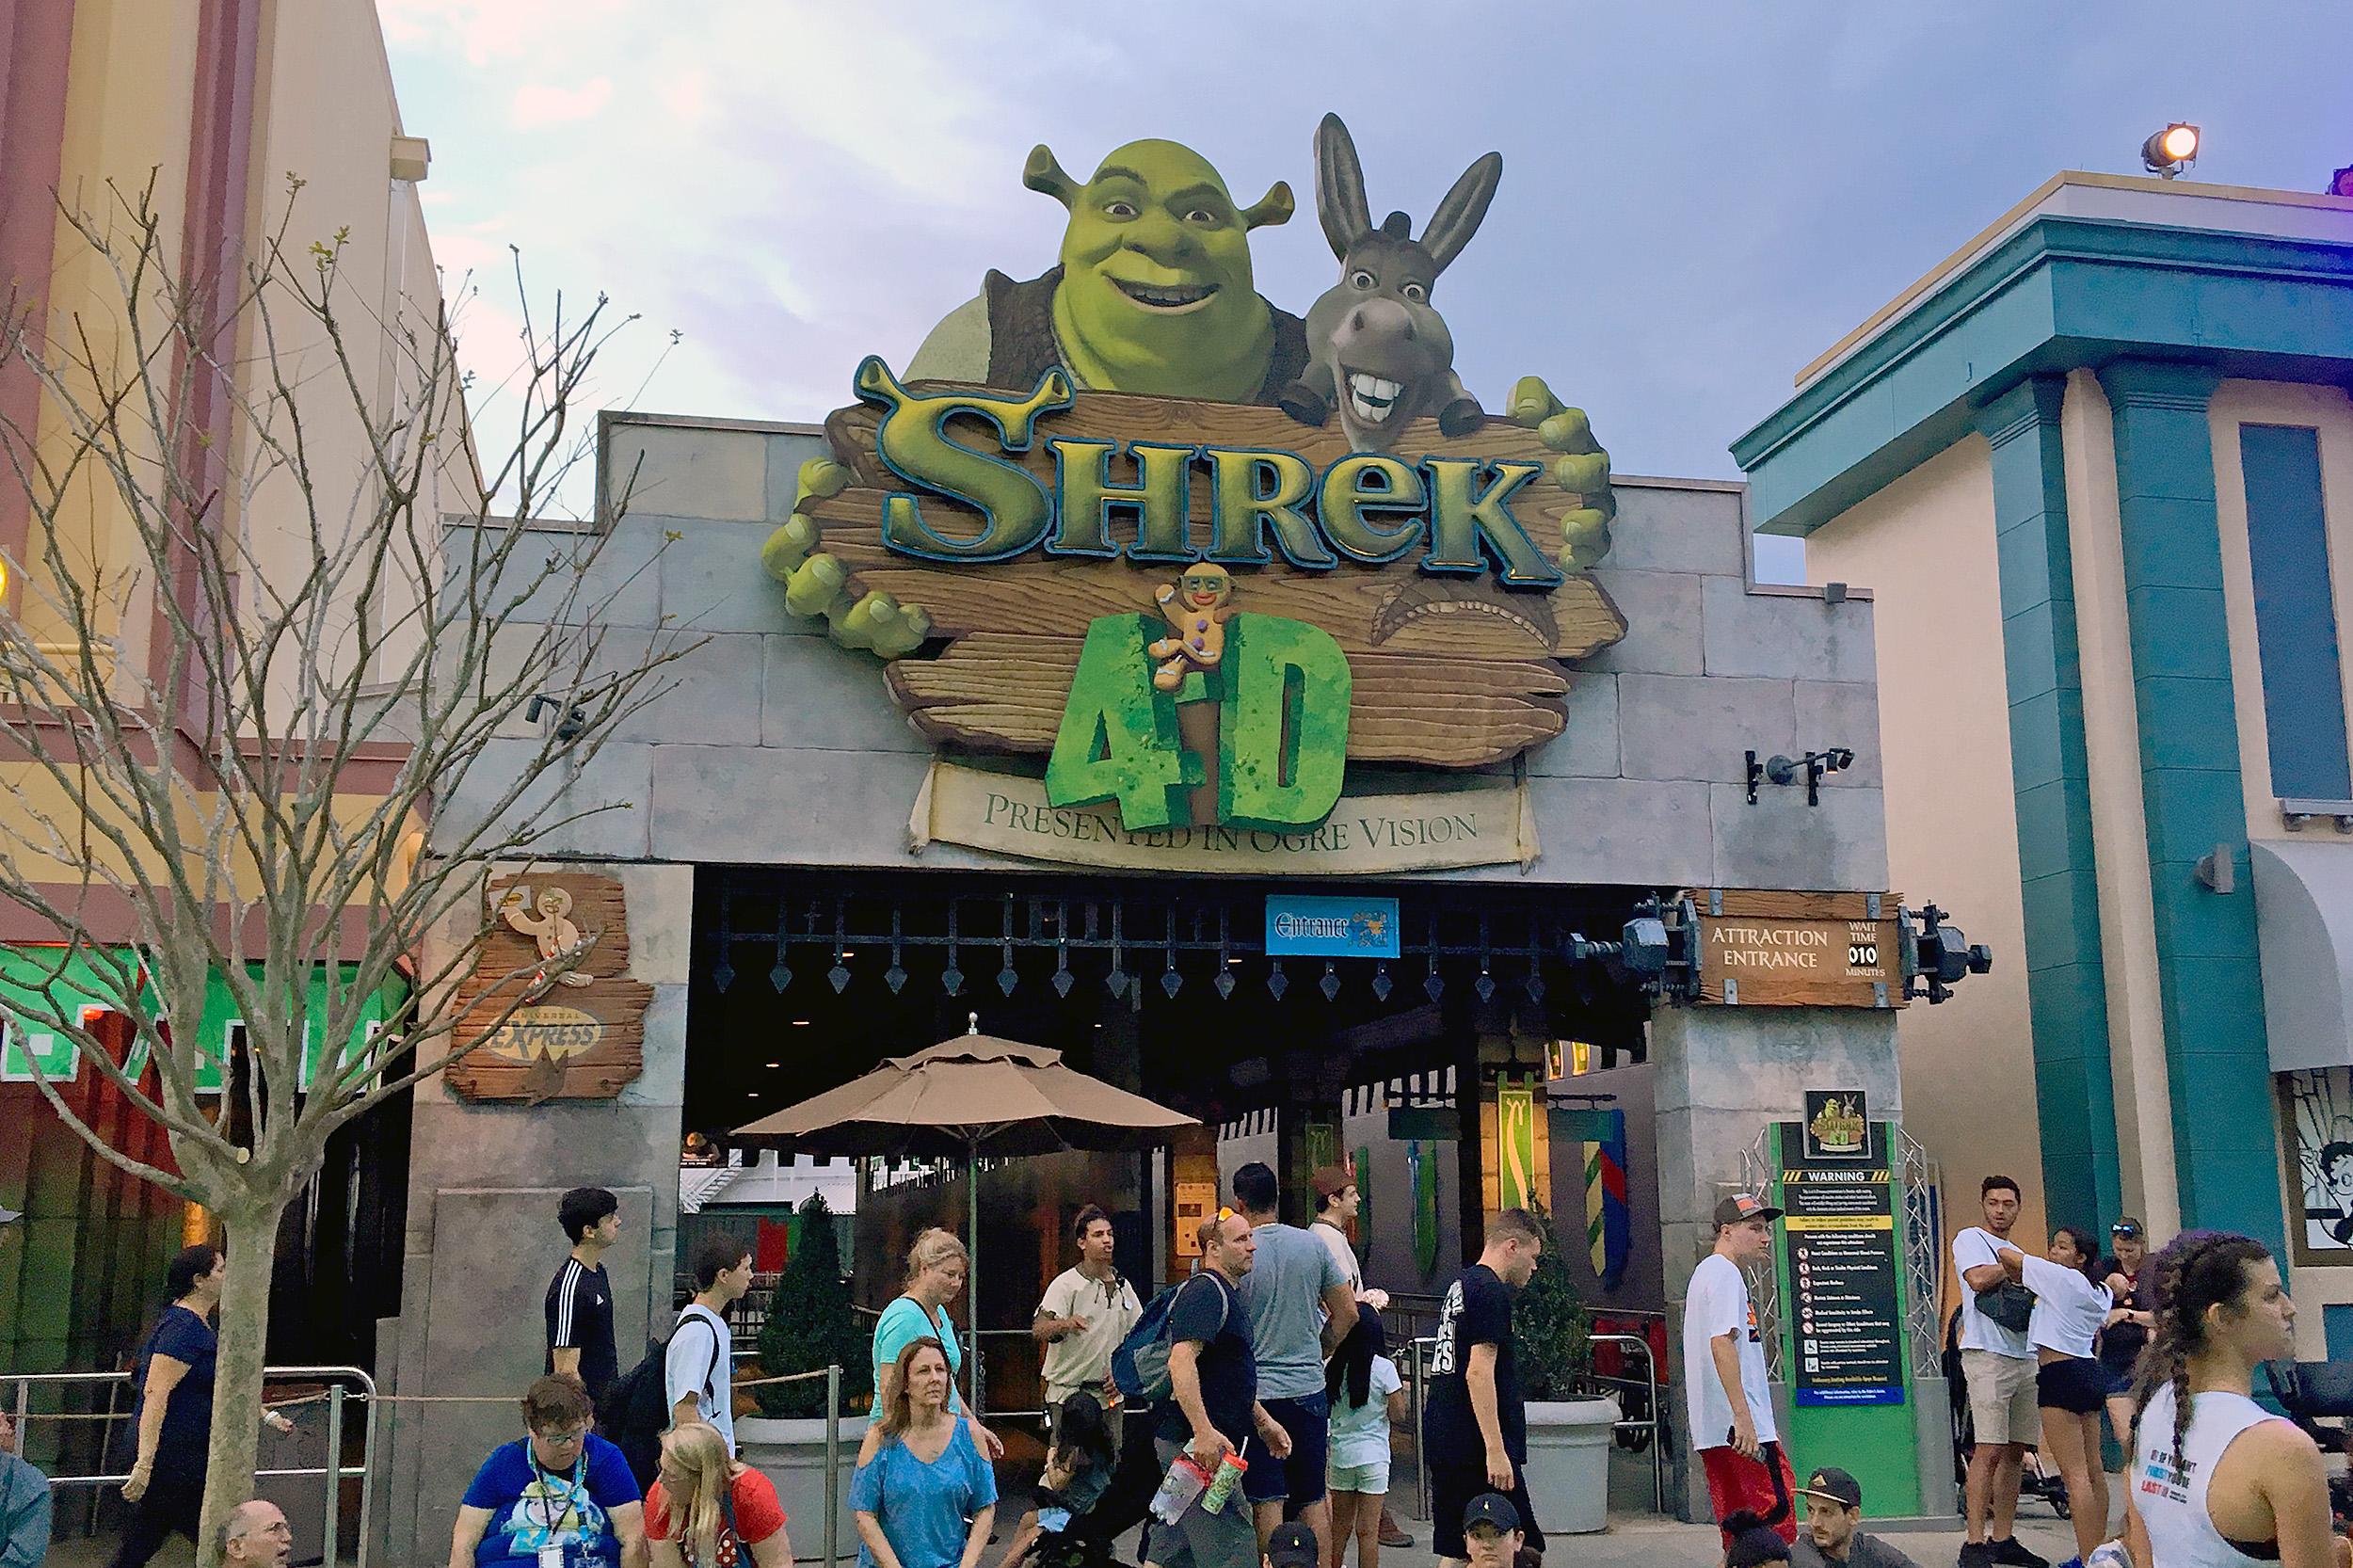 Shrek 4 D Åkattraktion Universal Studios Florida Åkattraktion